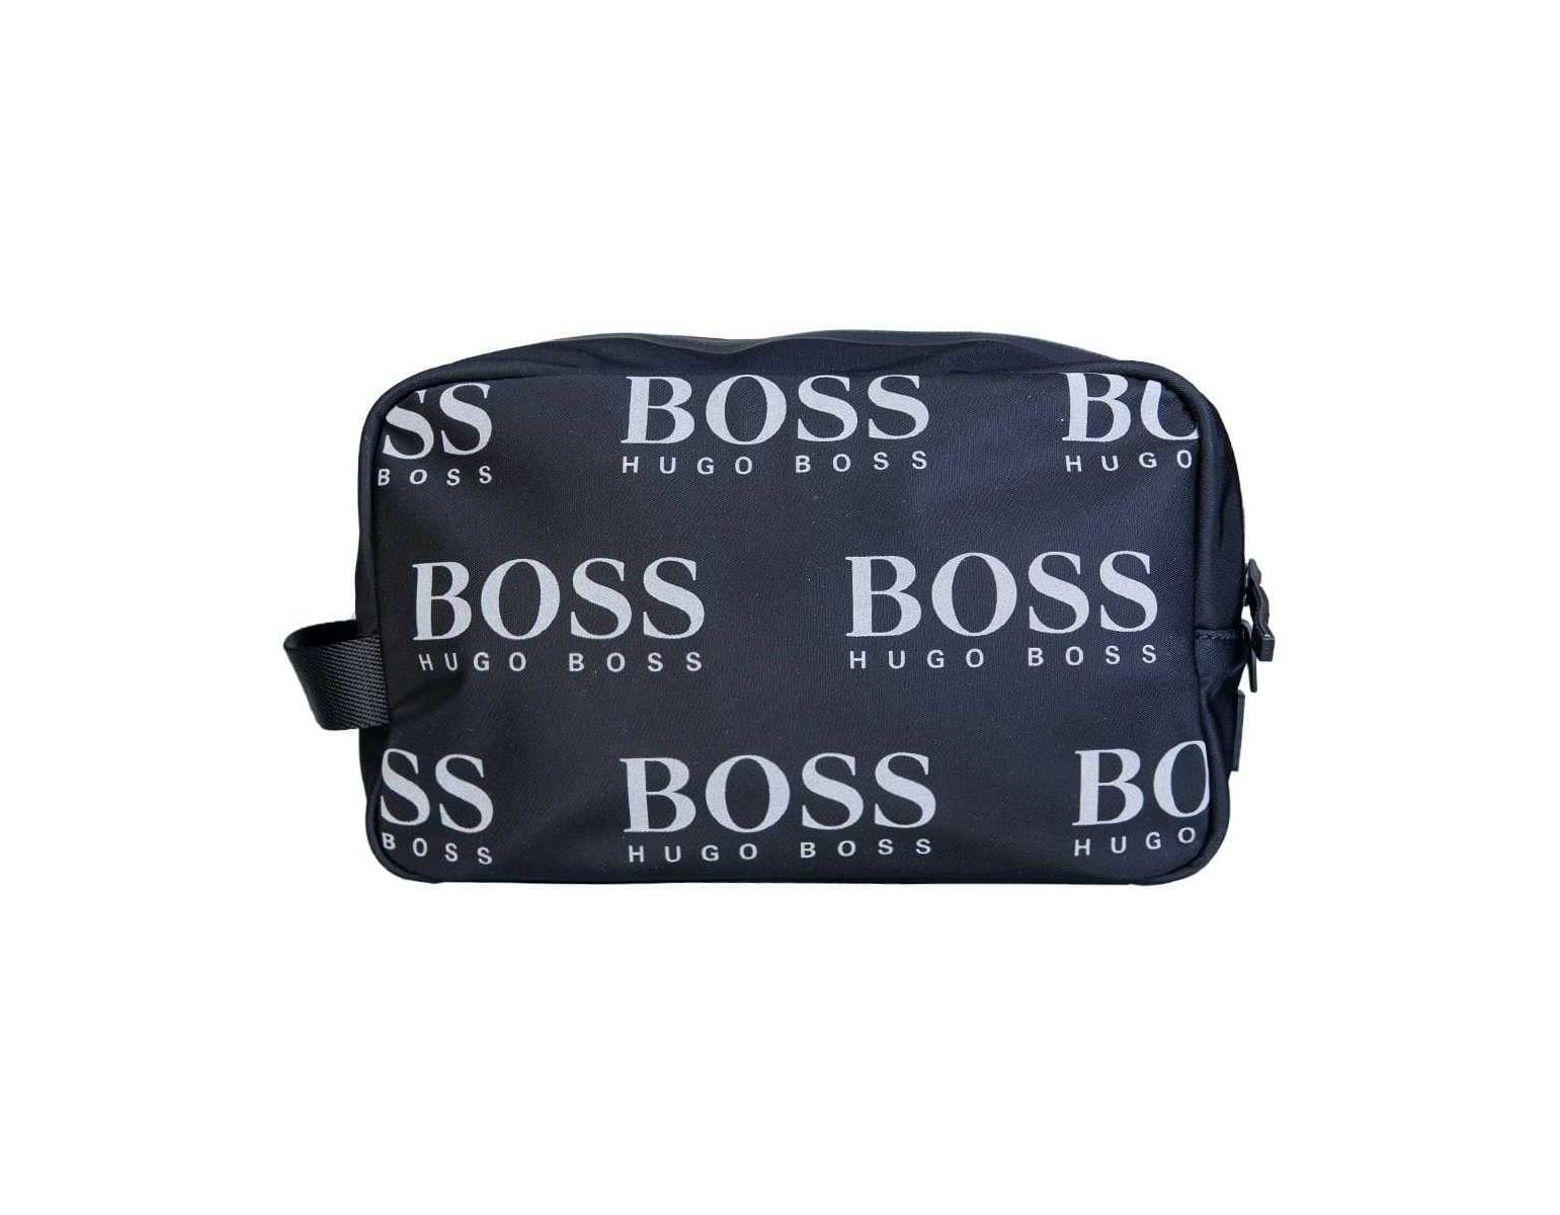 7ef4e2f8183ca BOSS Bag Model Quot;iconic Washbag 50402917 Quot; Men's Cosmetic Bag In  Black in Black for Men - Lyst